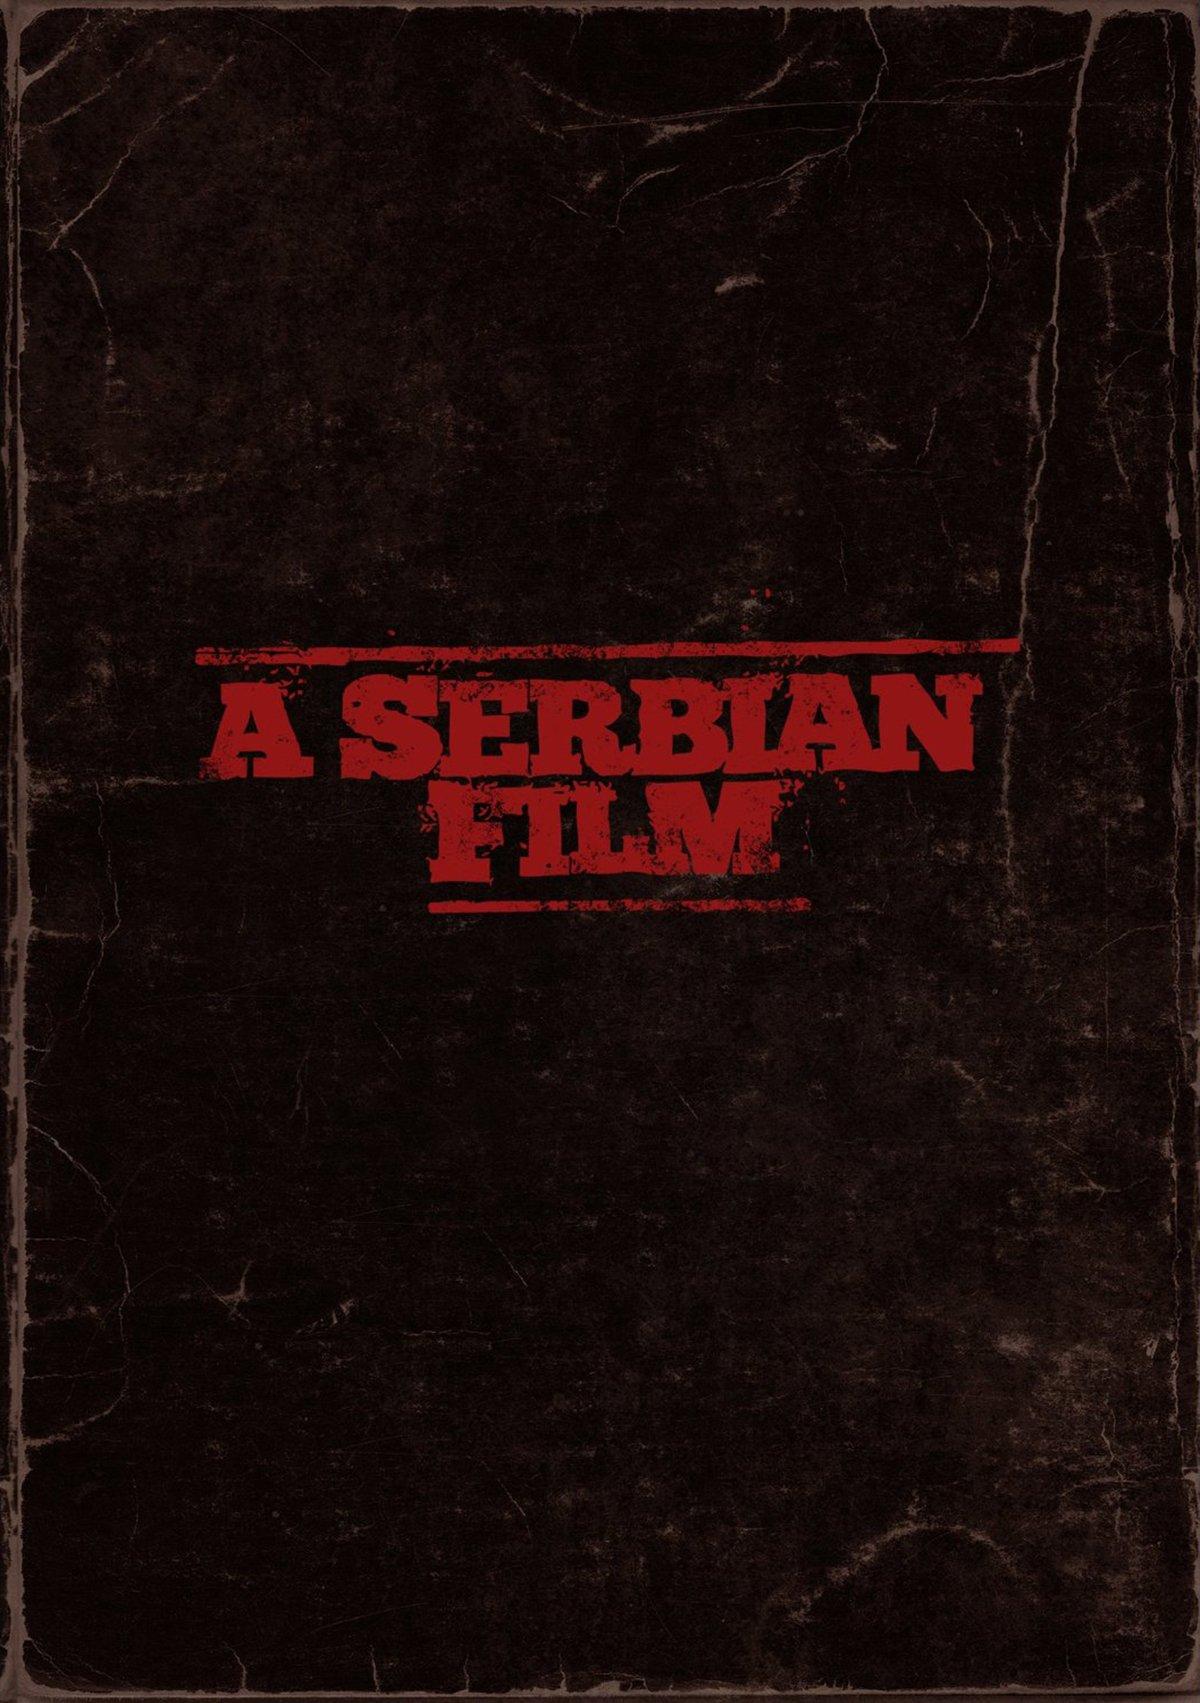 A Serbian Film Porno dvd review: a serbian film - slant magazine